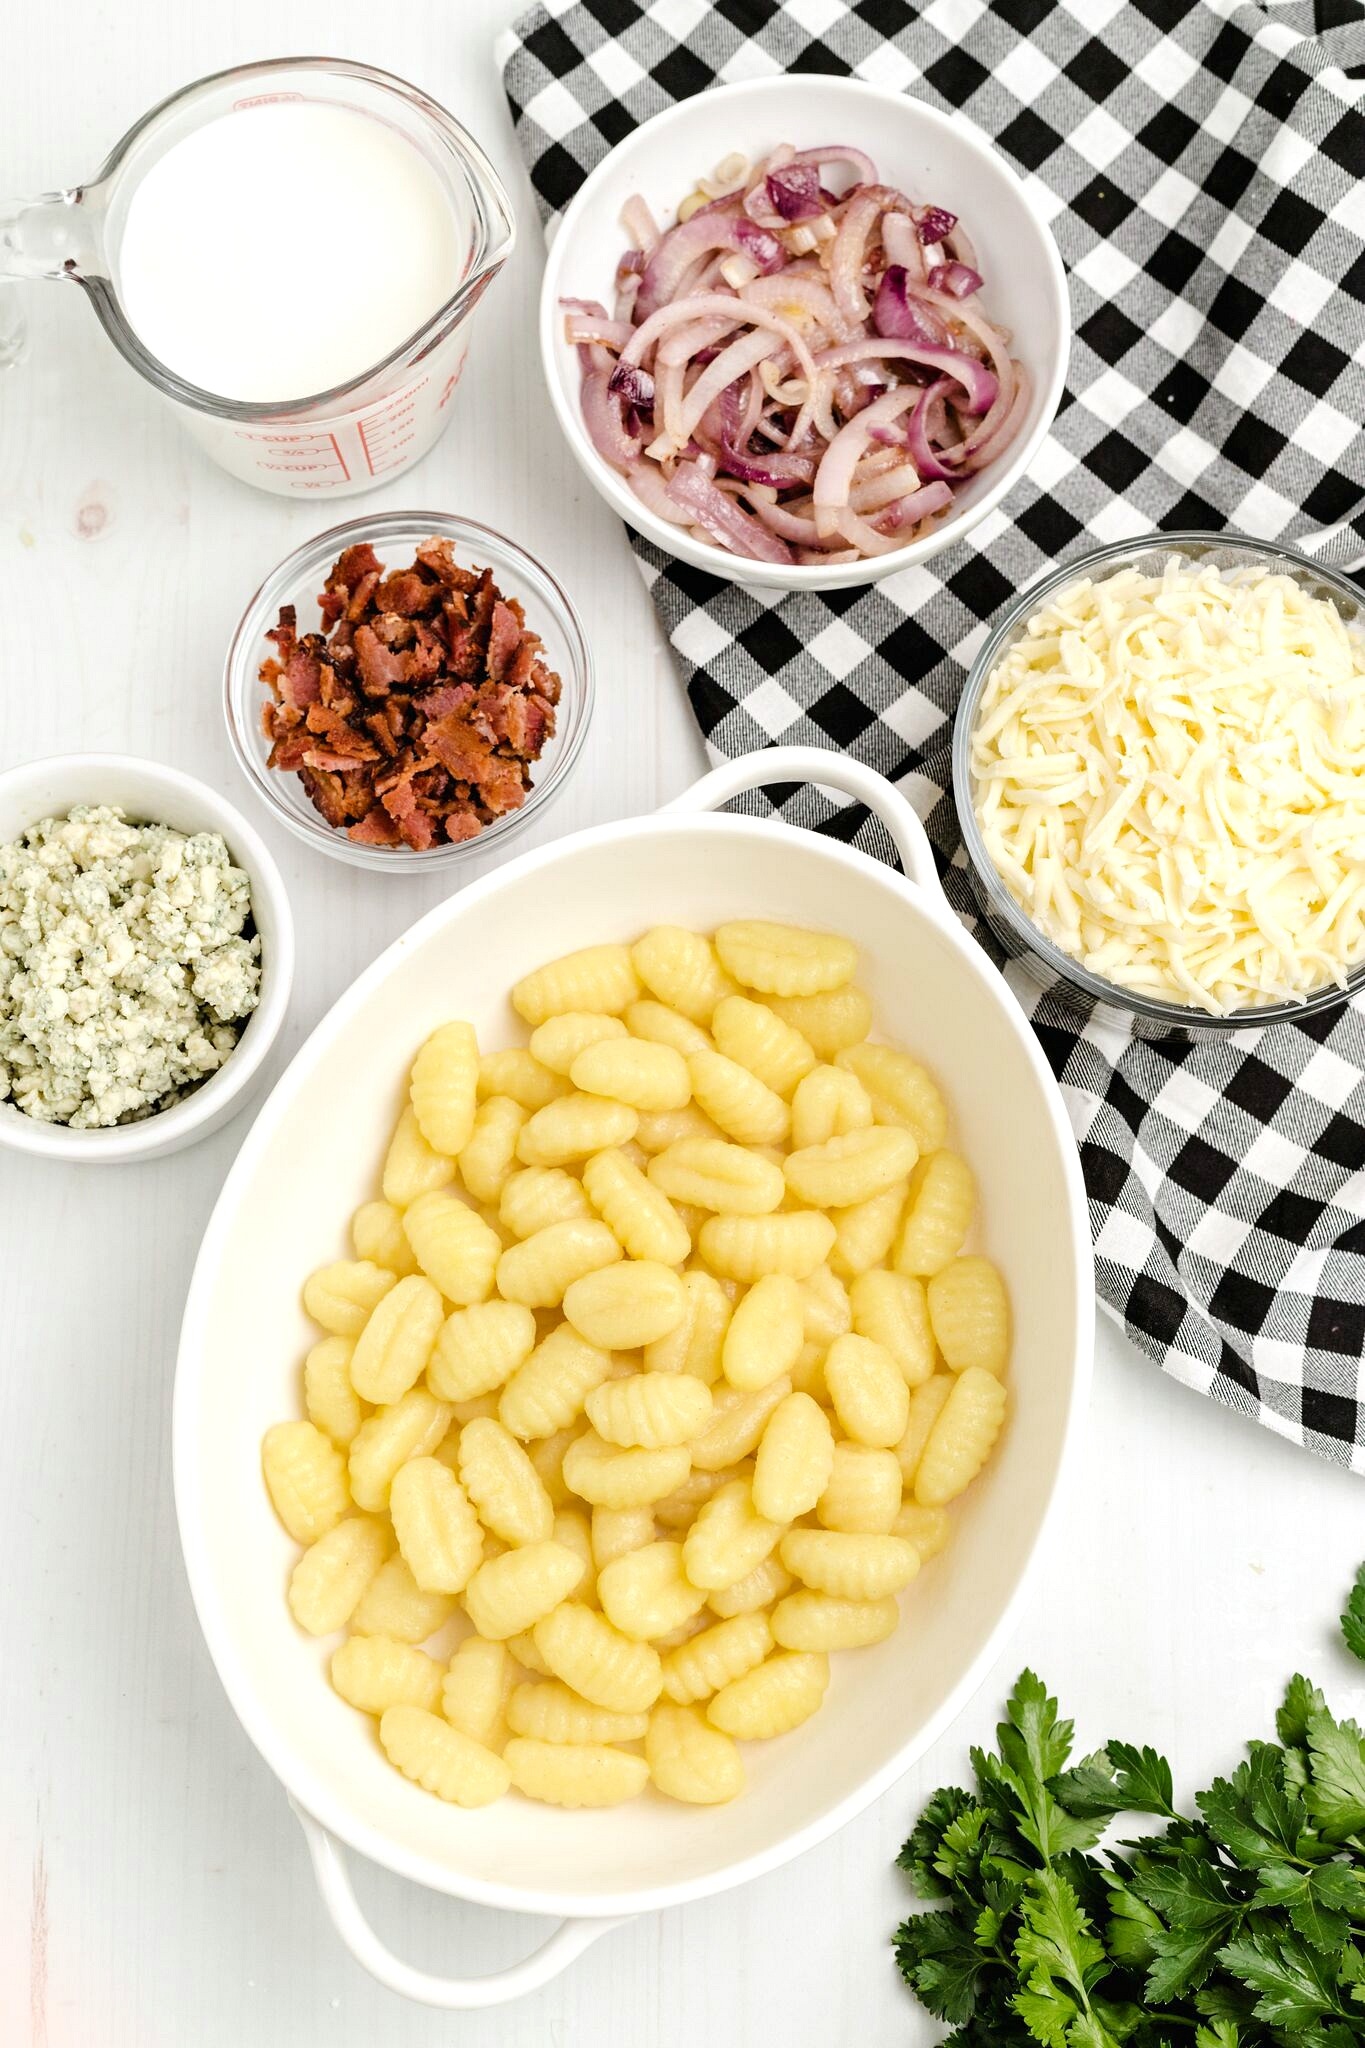 Gnocchi Macaroni and Cheese